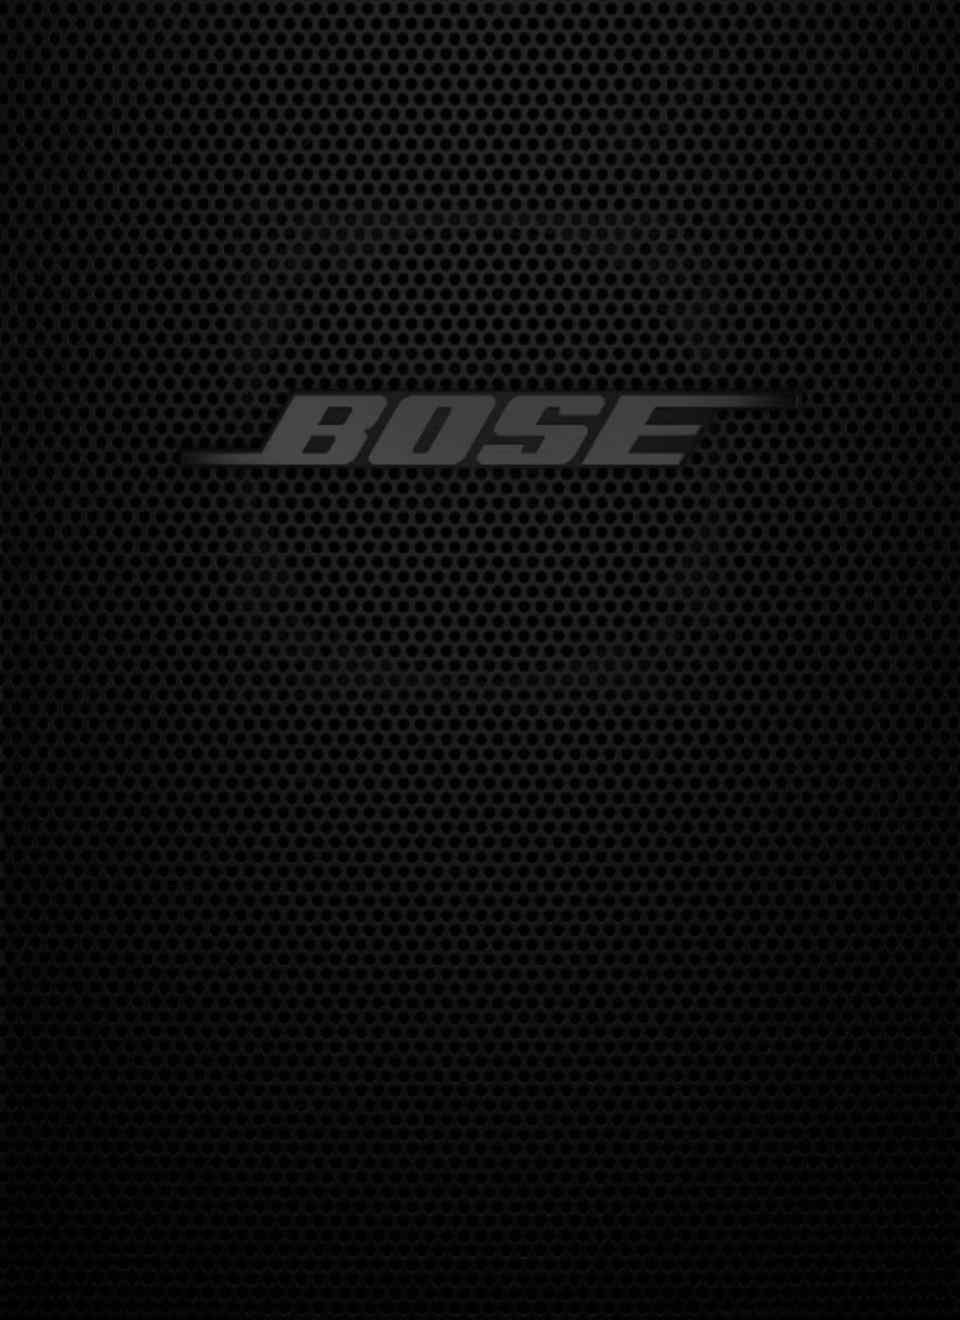 Bose Presents